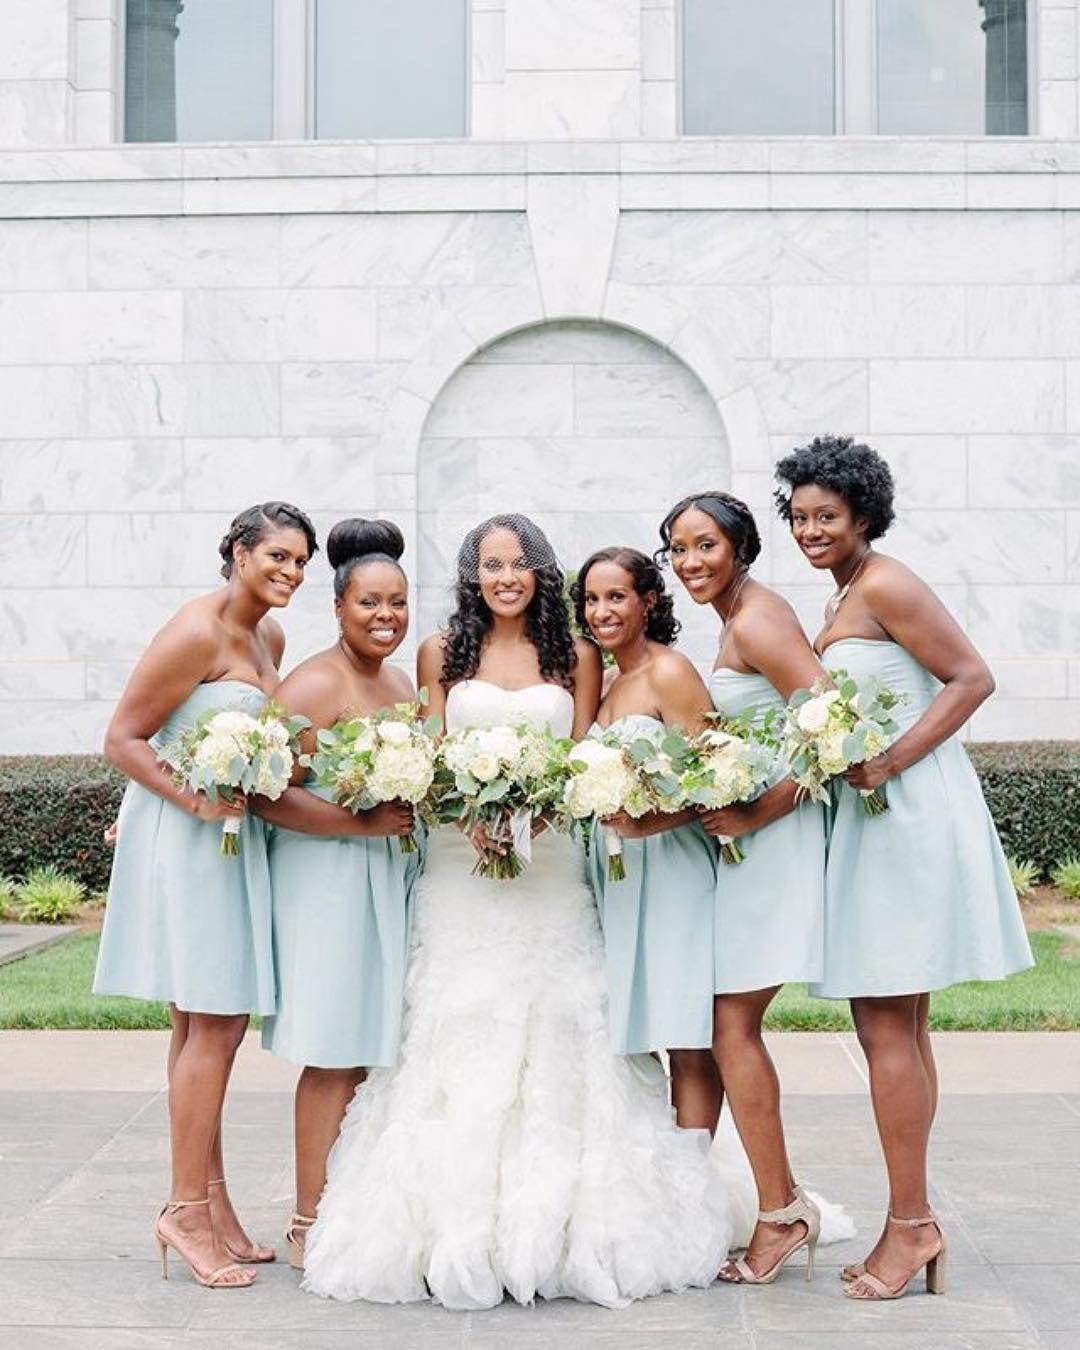 Jcrew wedding dress  So pretty munabridesmaids munaluchi munaluchibride    Repost